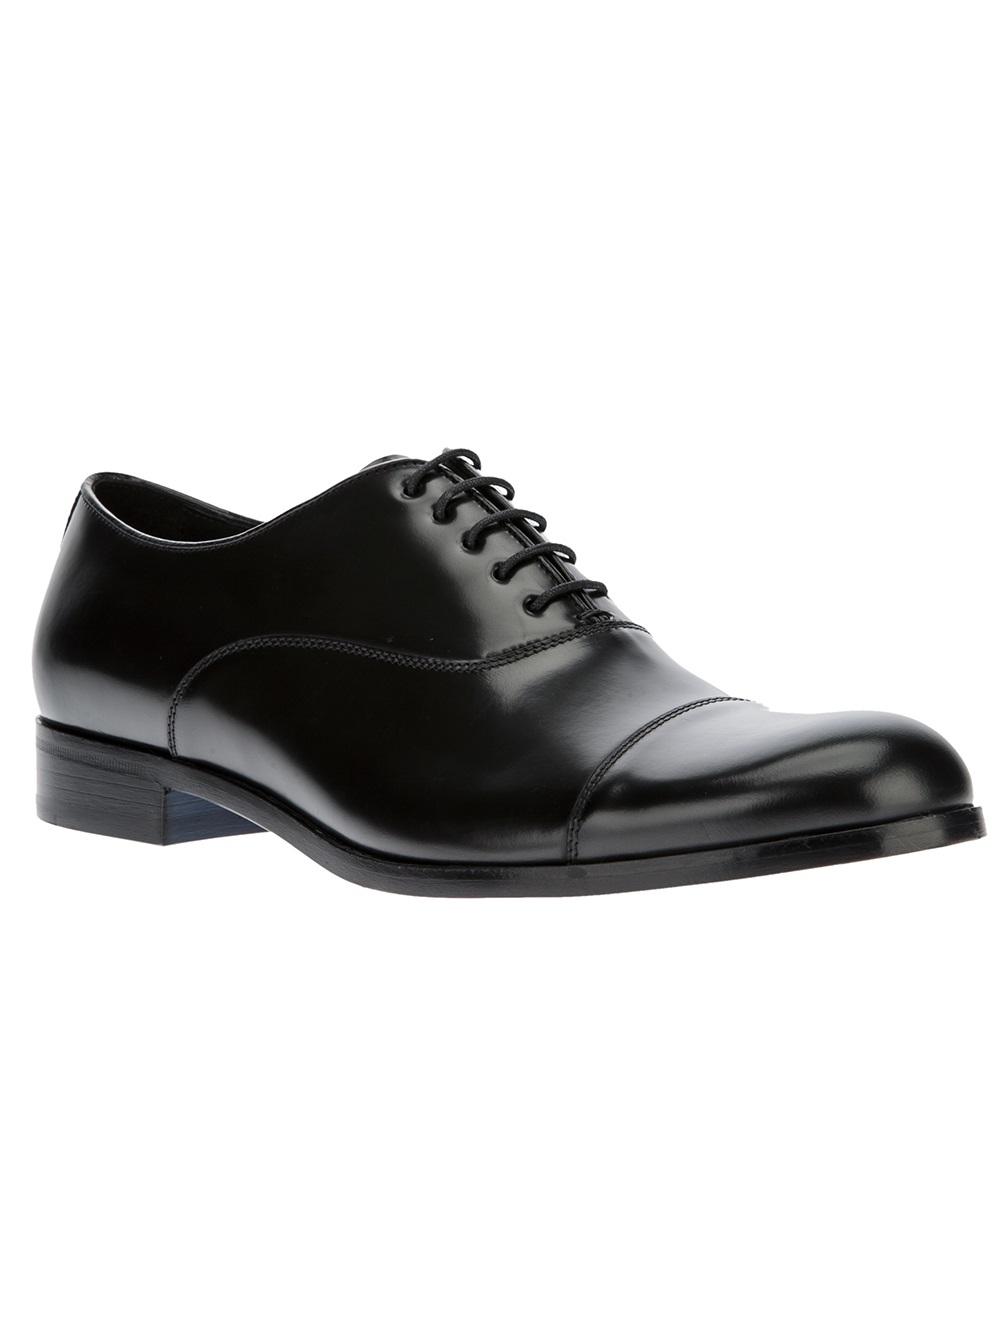 Emporio Armani Shoes Mens